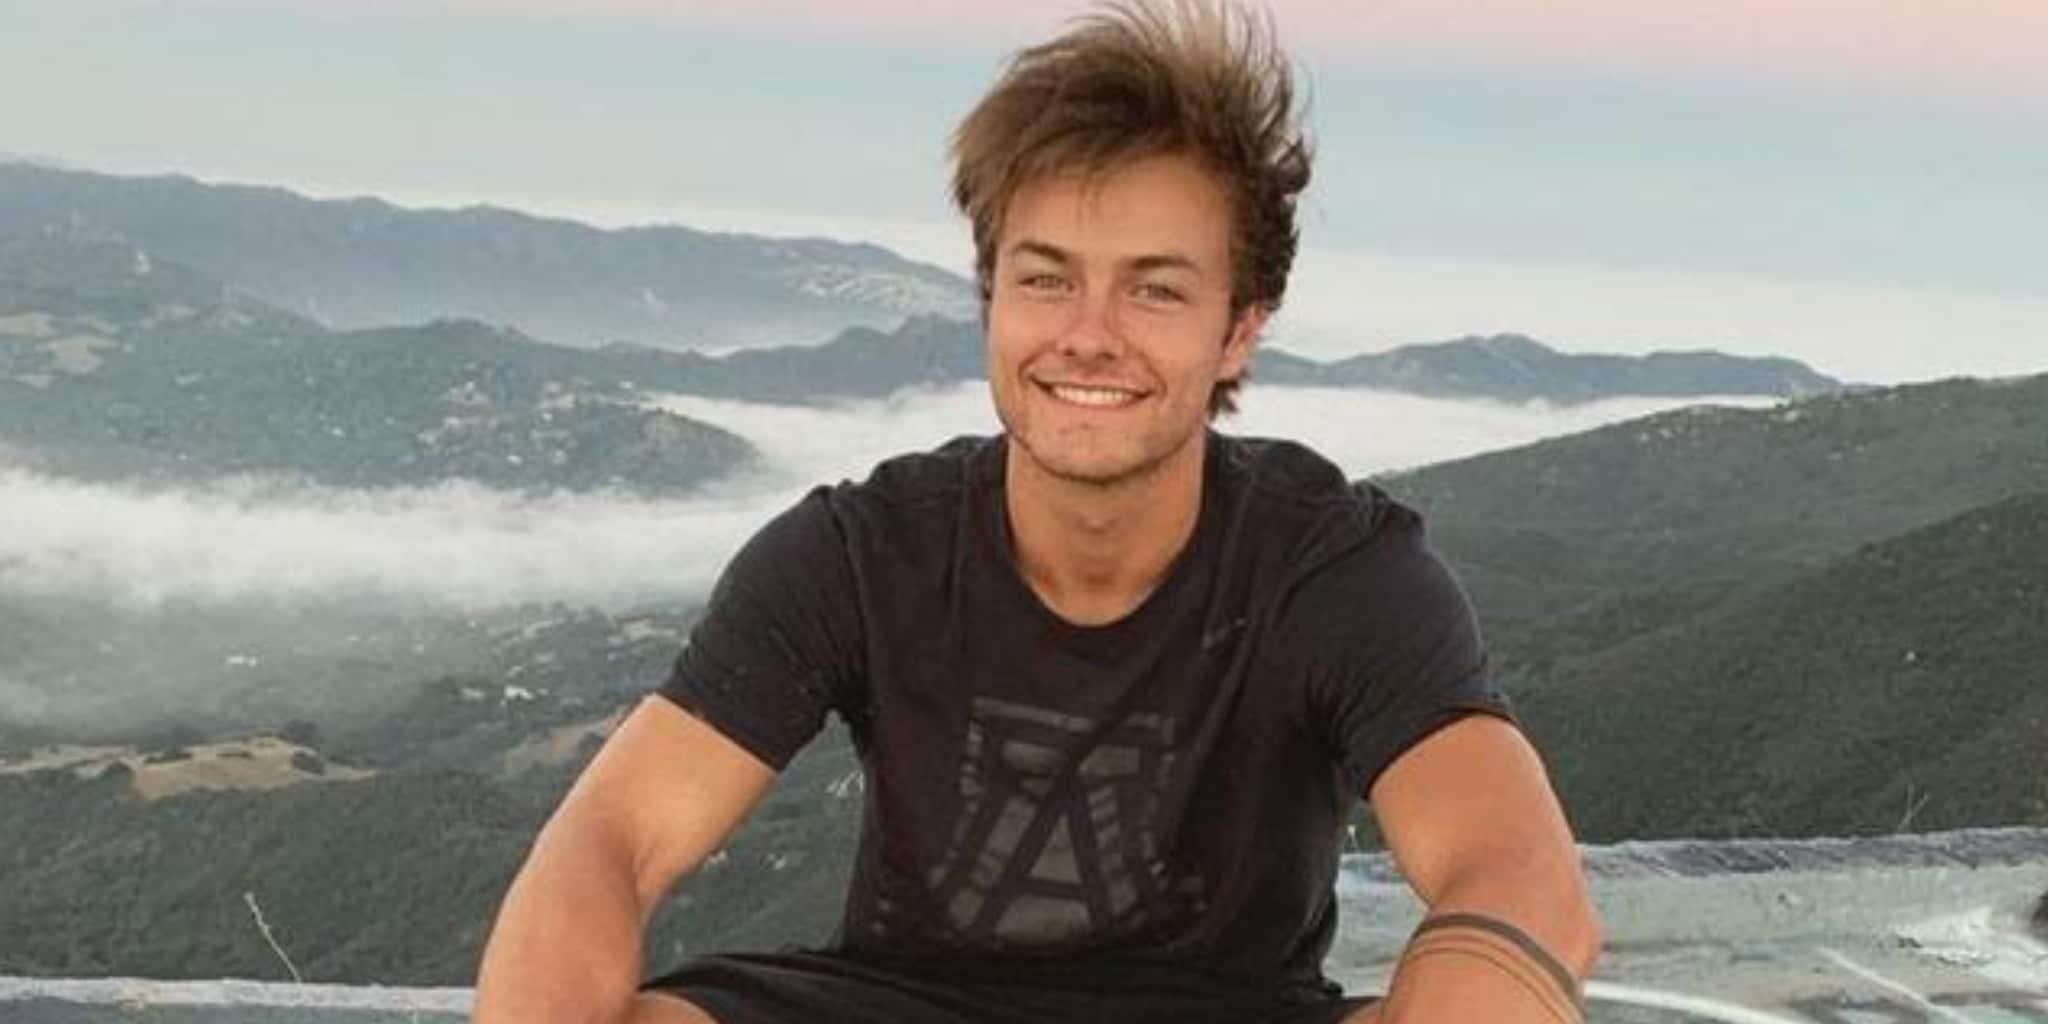 Peyton Meyer biography, age, son, girlfriend, movies, other updates